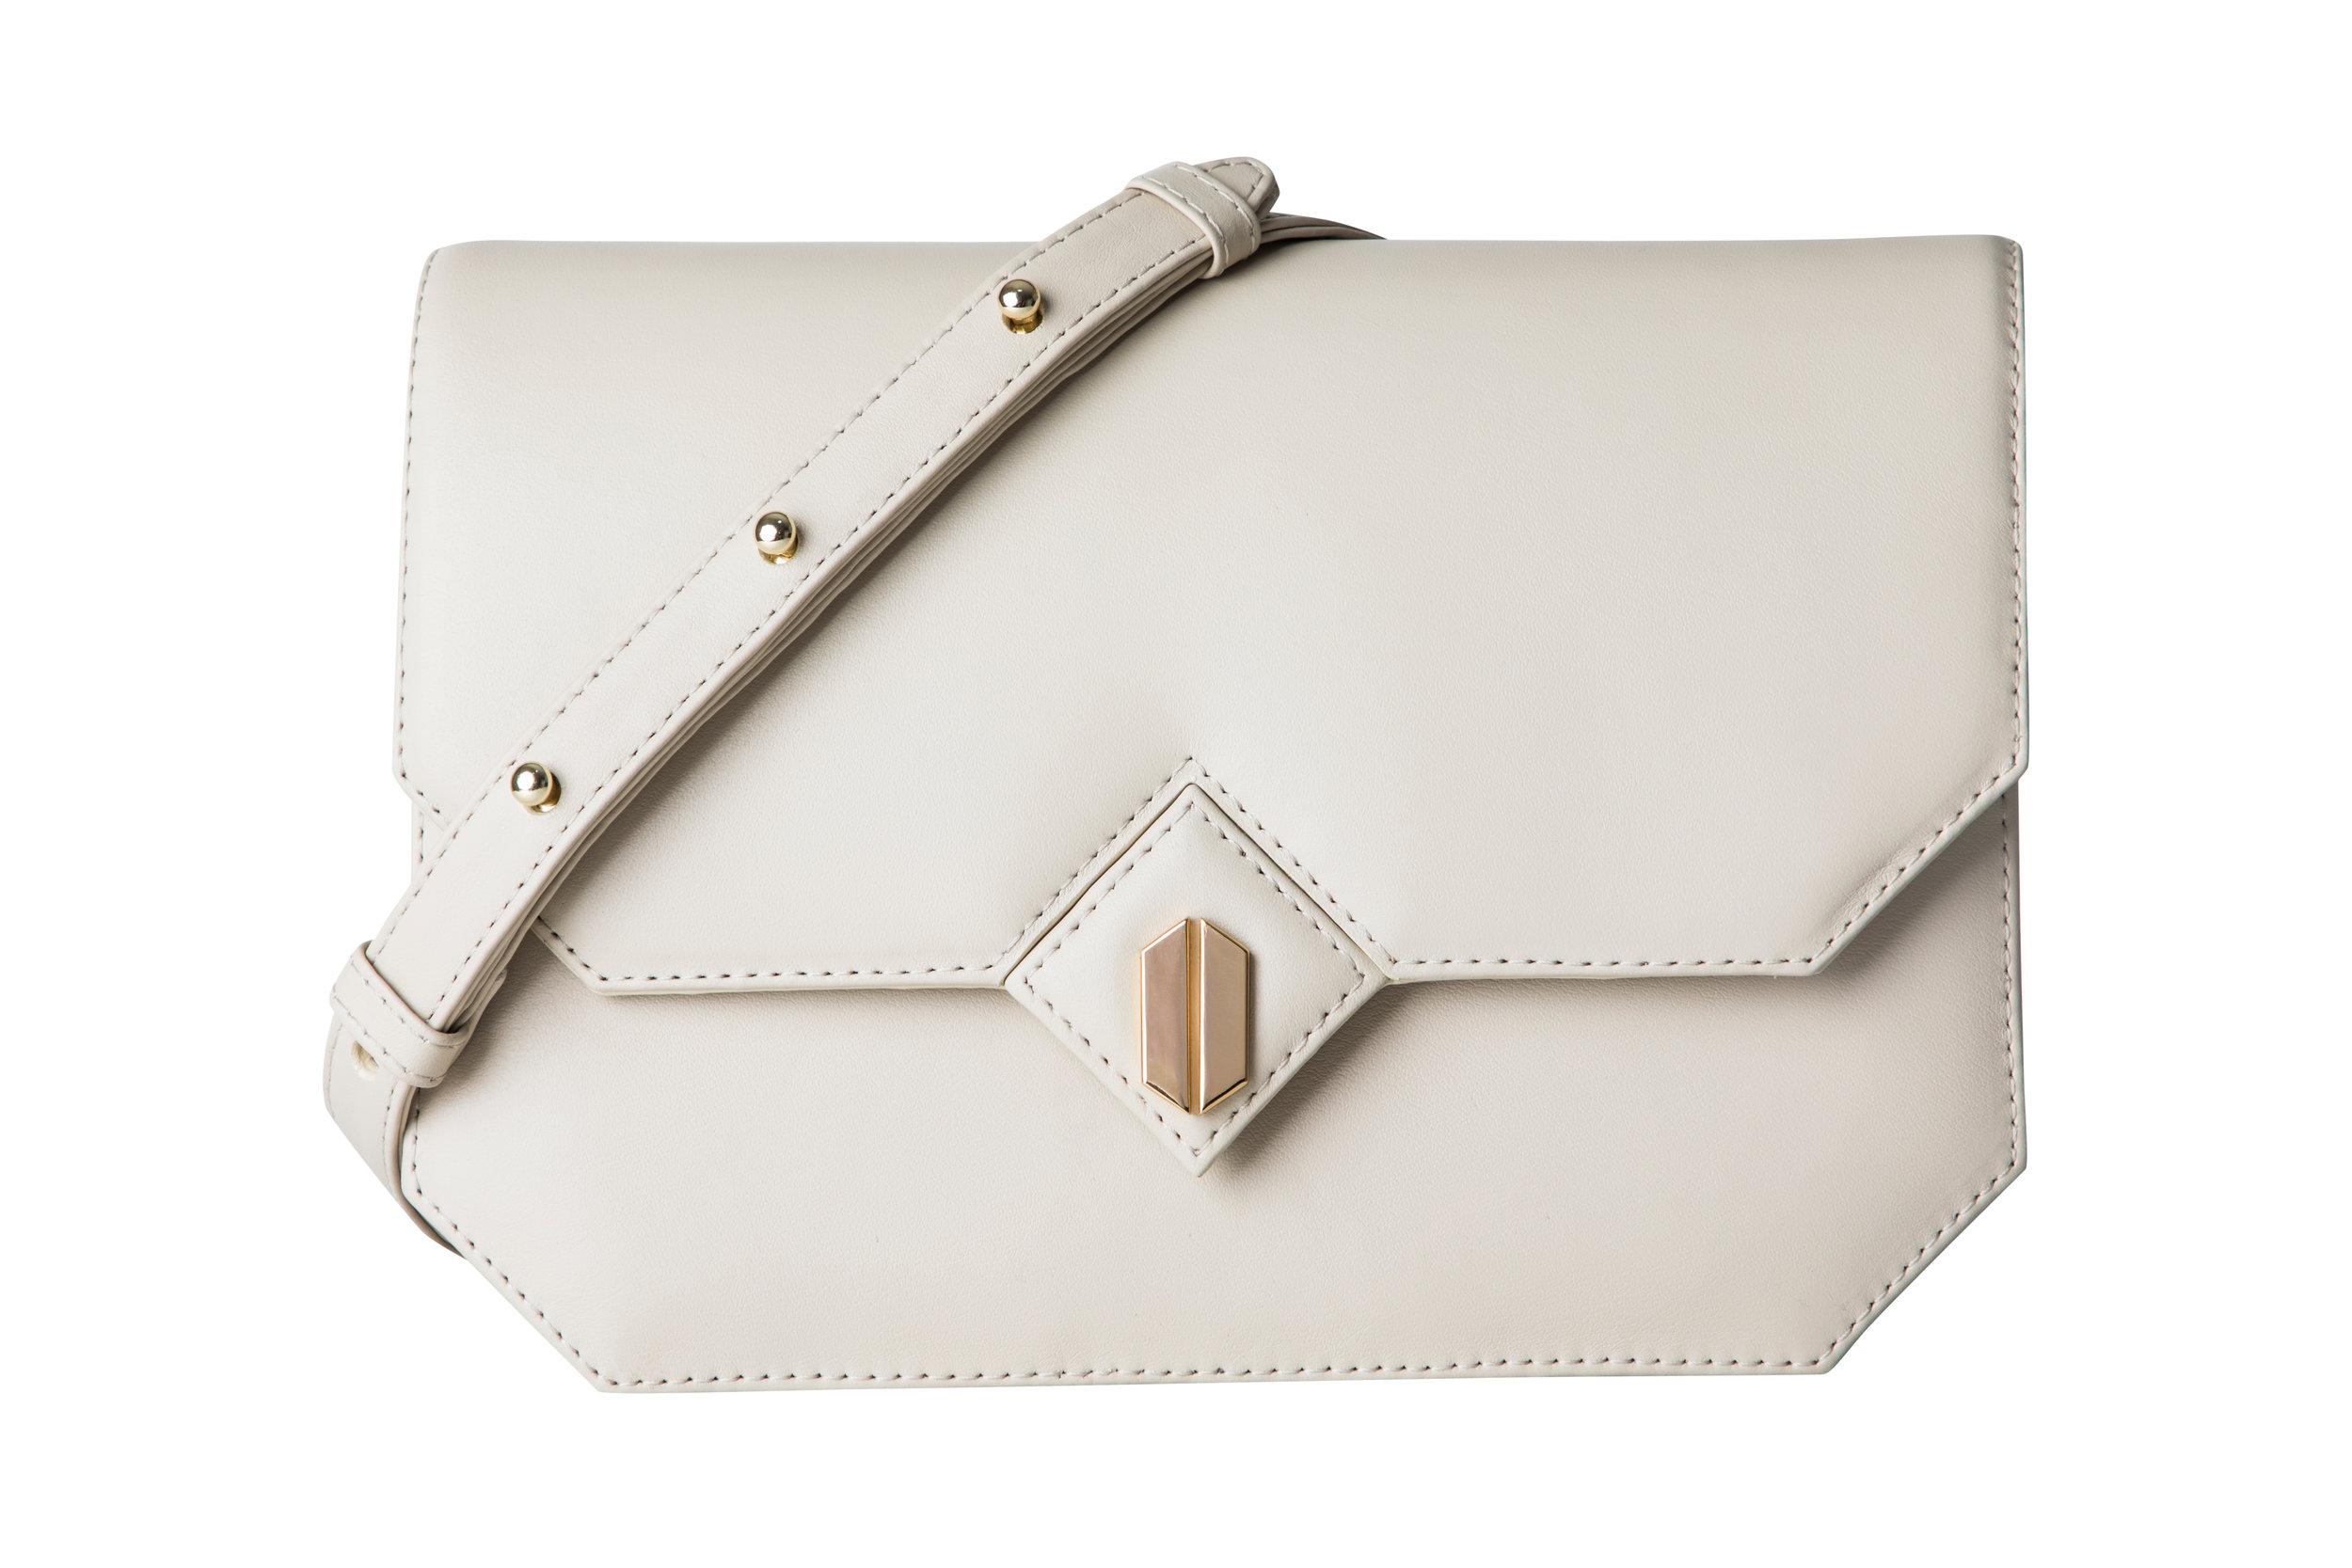 Galatea Bag in Ivory $445 USD